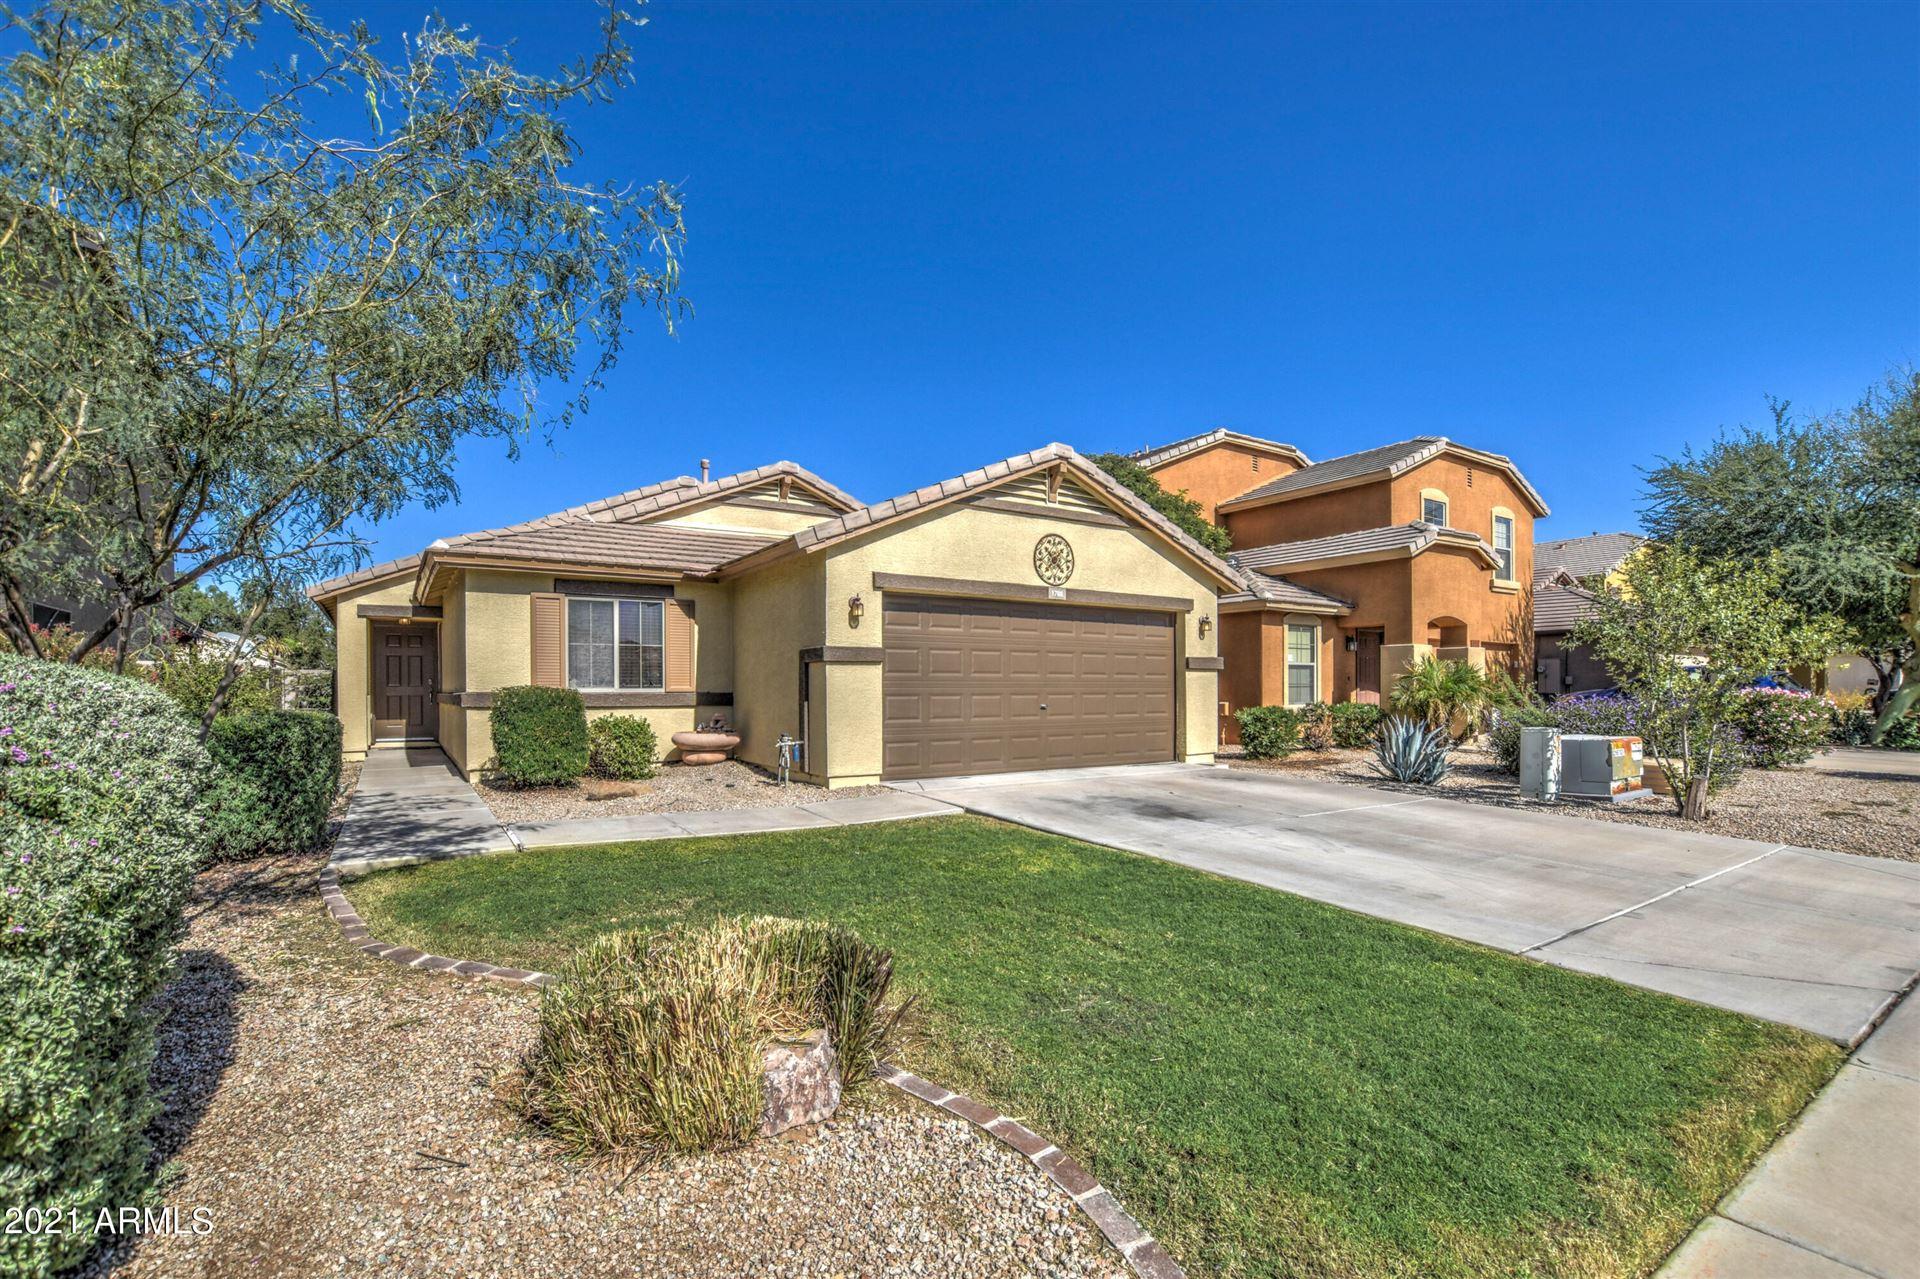 Photo of 1788 W DESERT MOUNTAIN Drive, Queen Creek, AZ 85142 (MLS # 6306012)